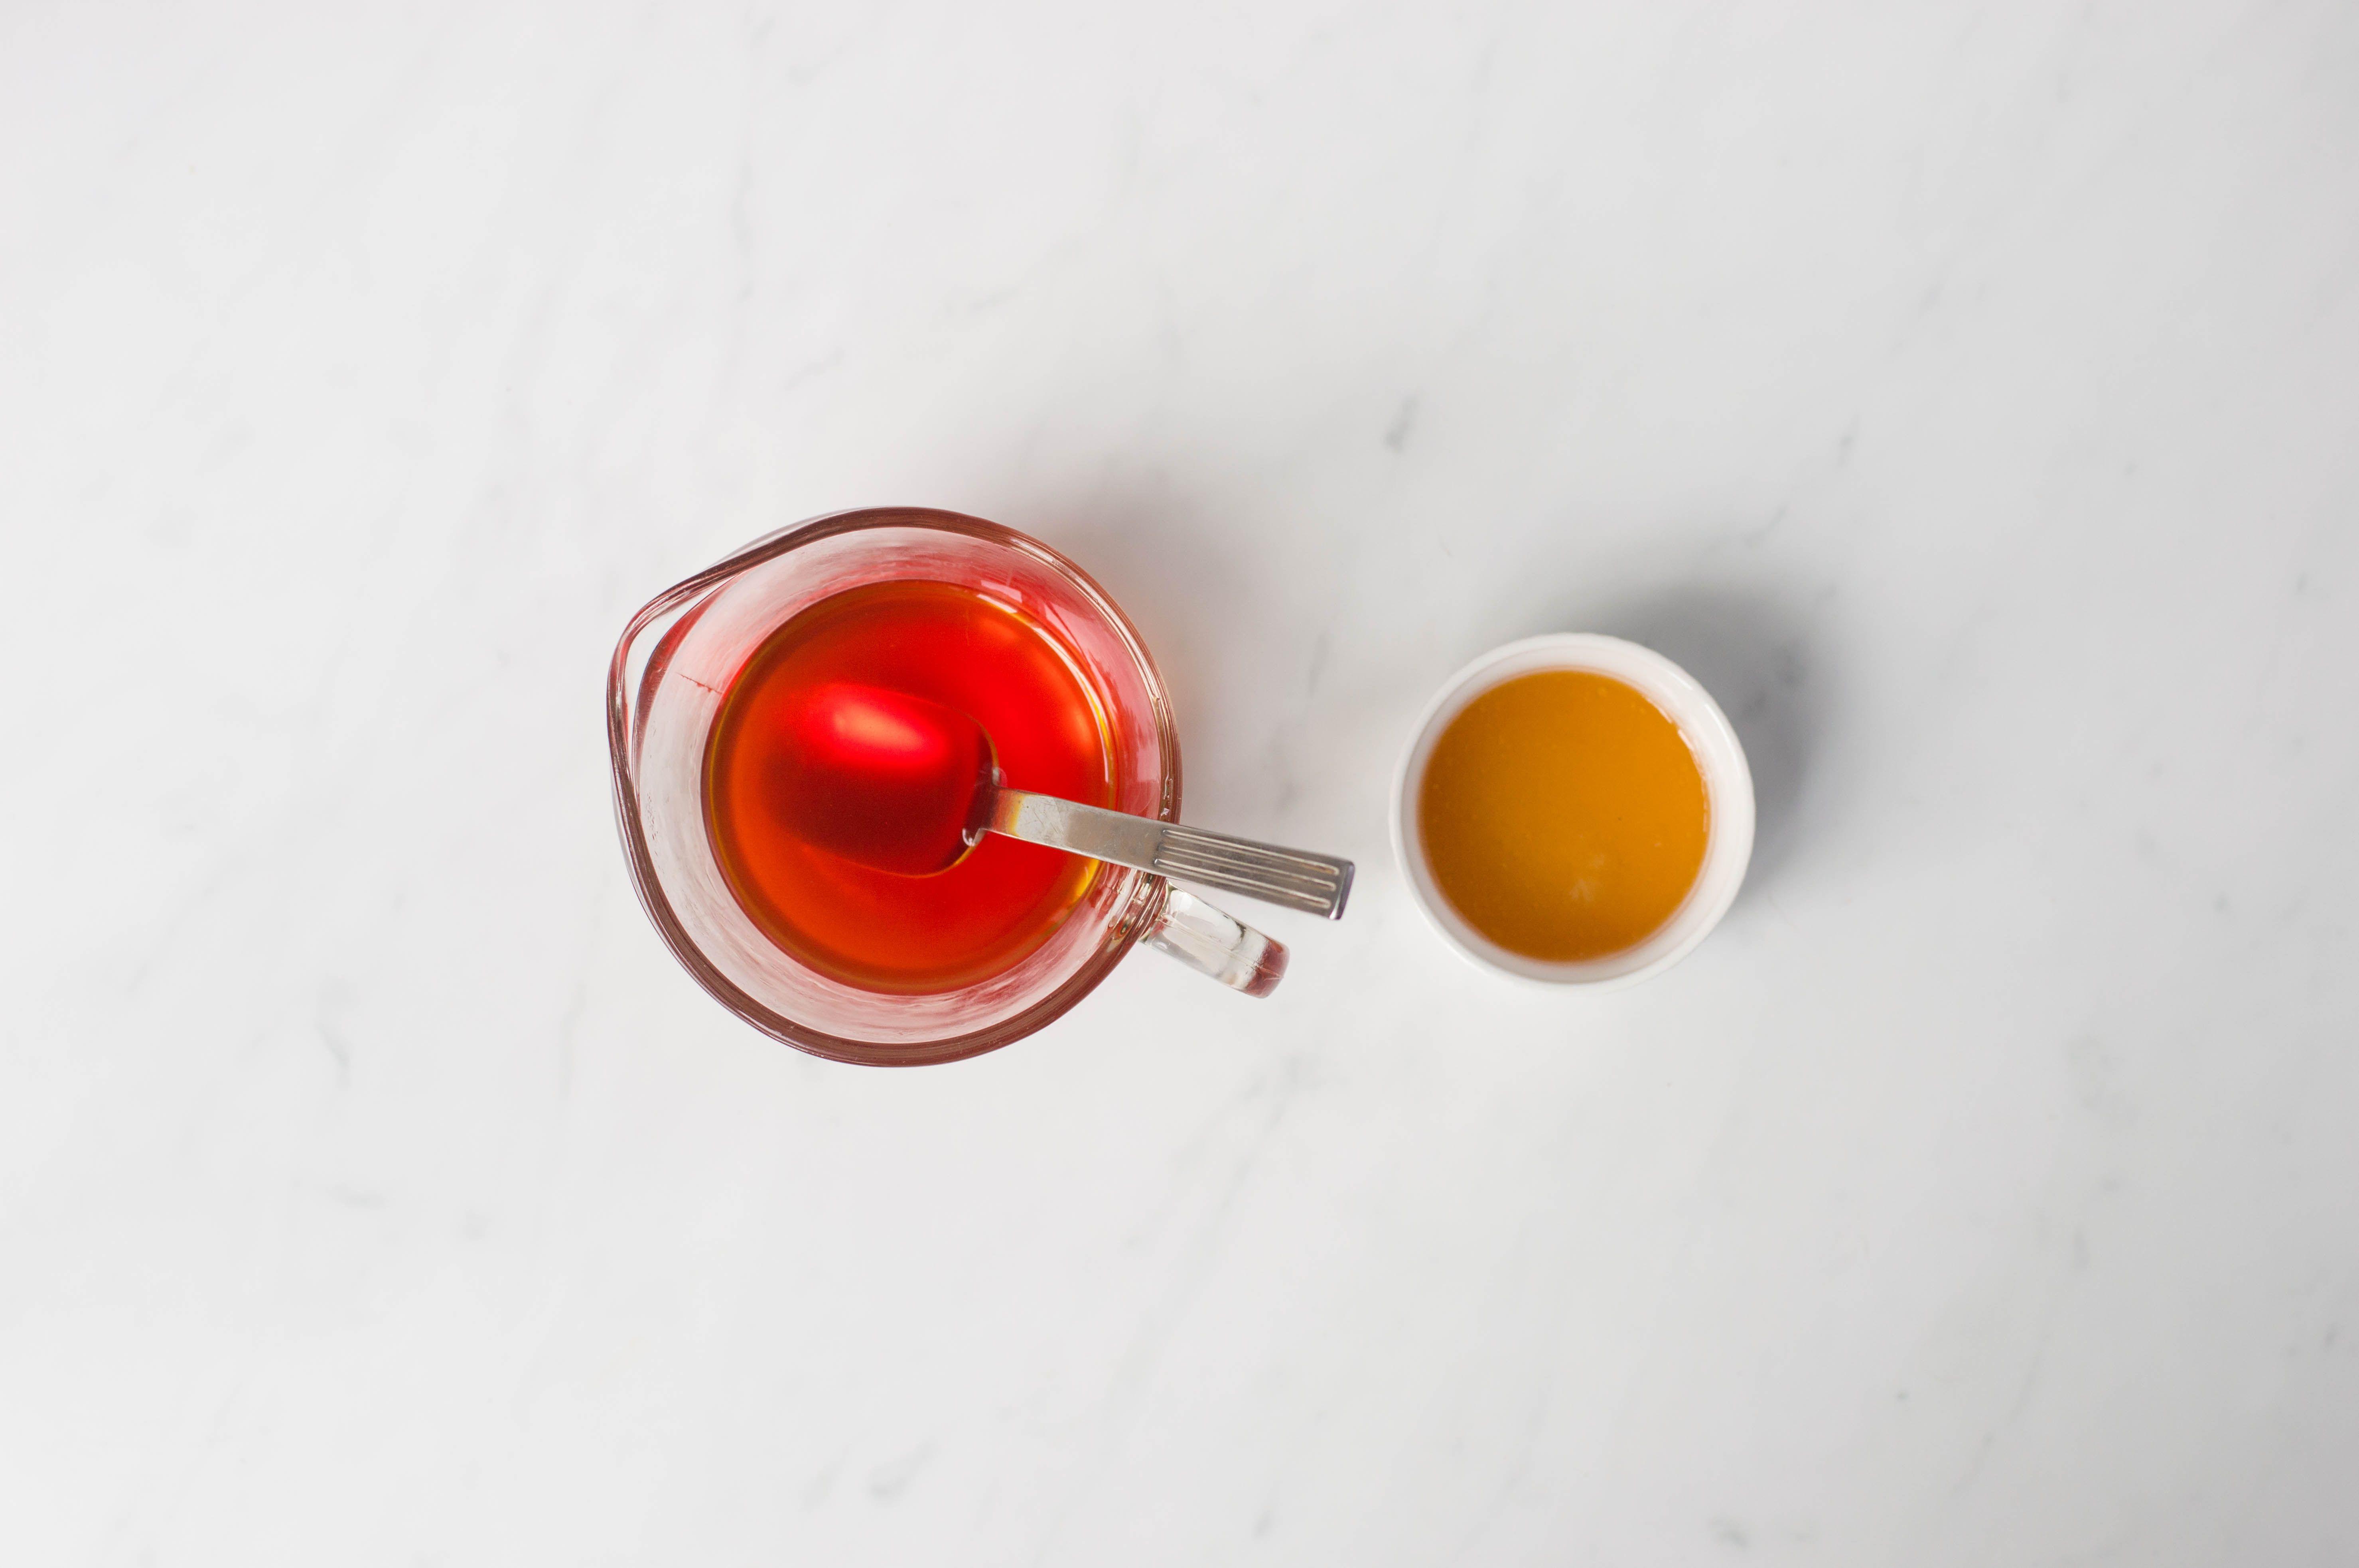 stir marmalade into jelly